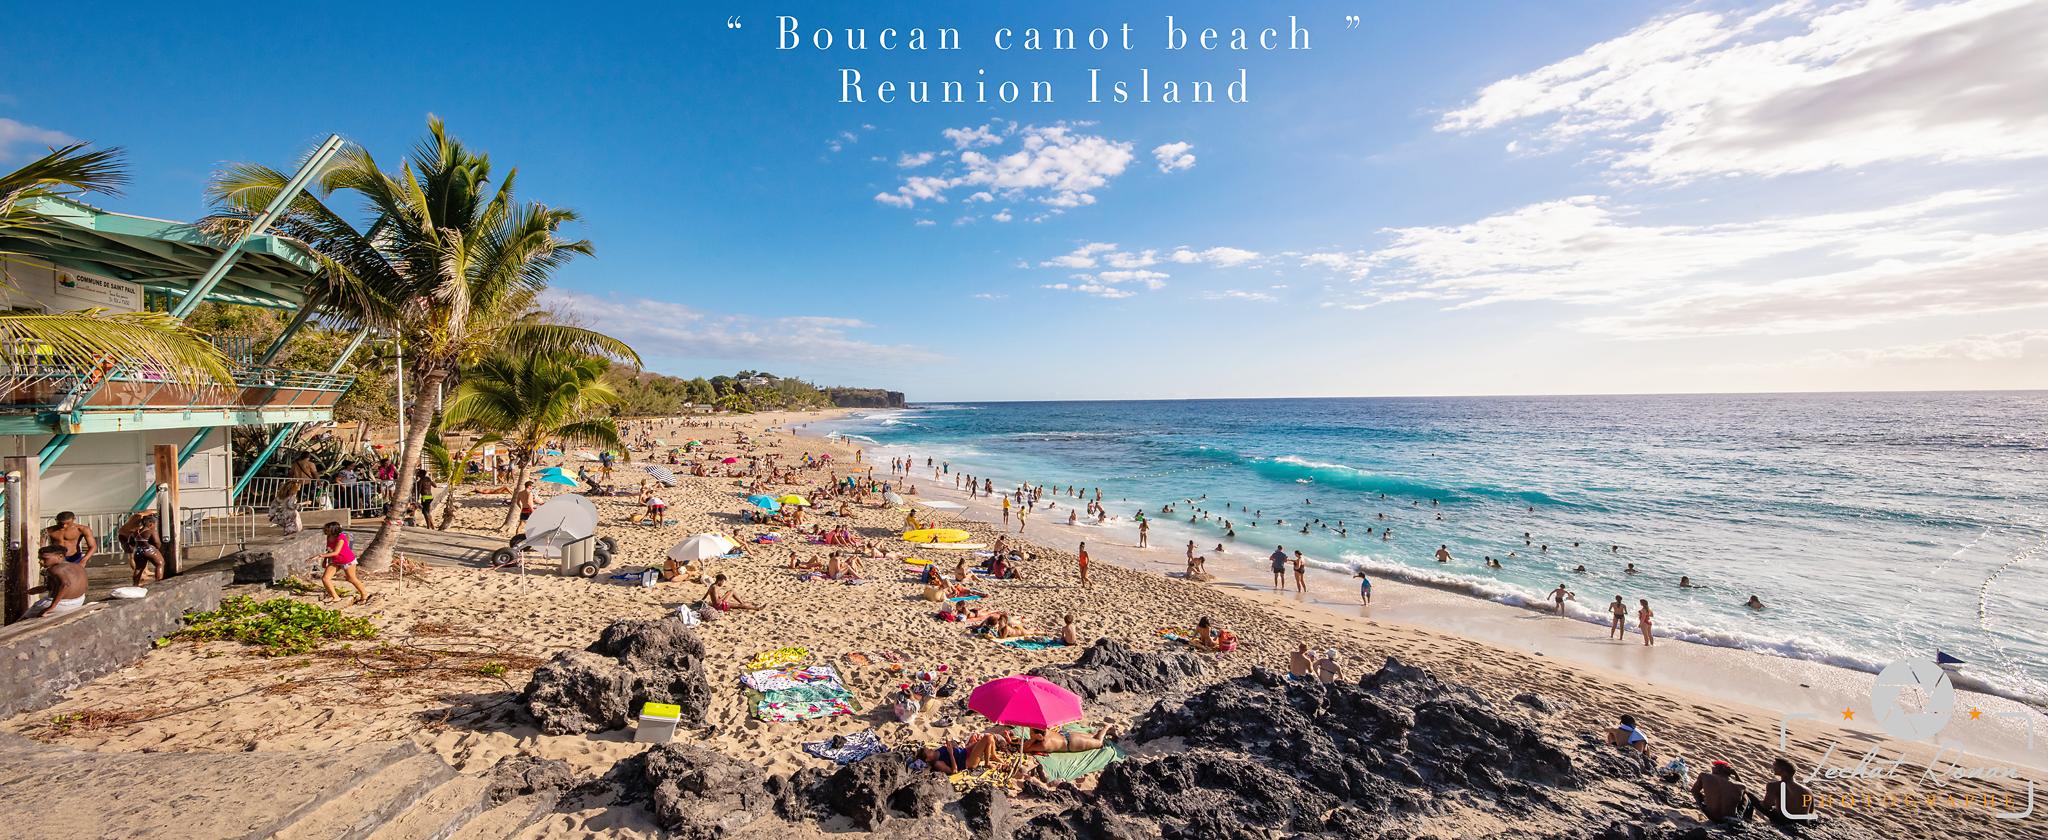 boucan canot beach plage reunion island